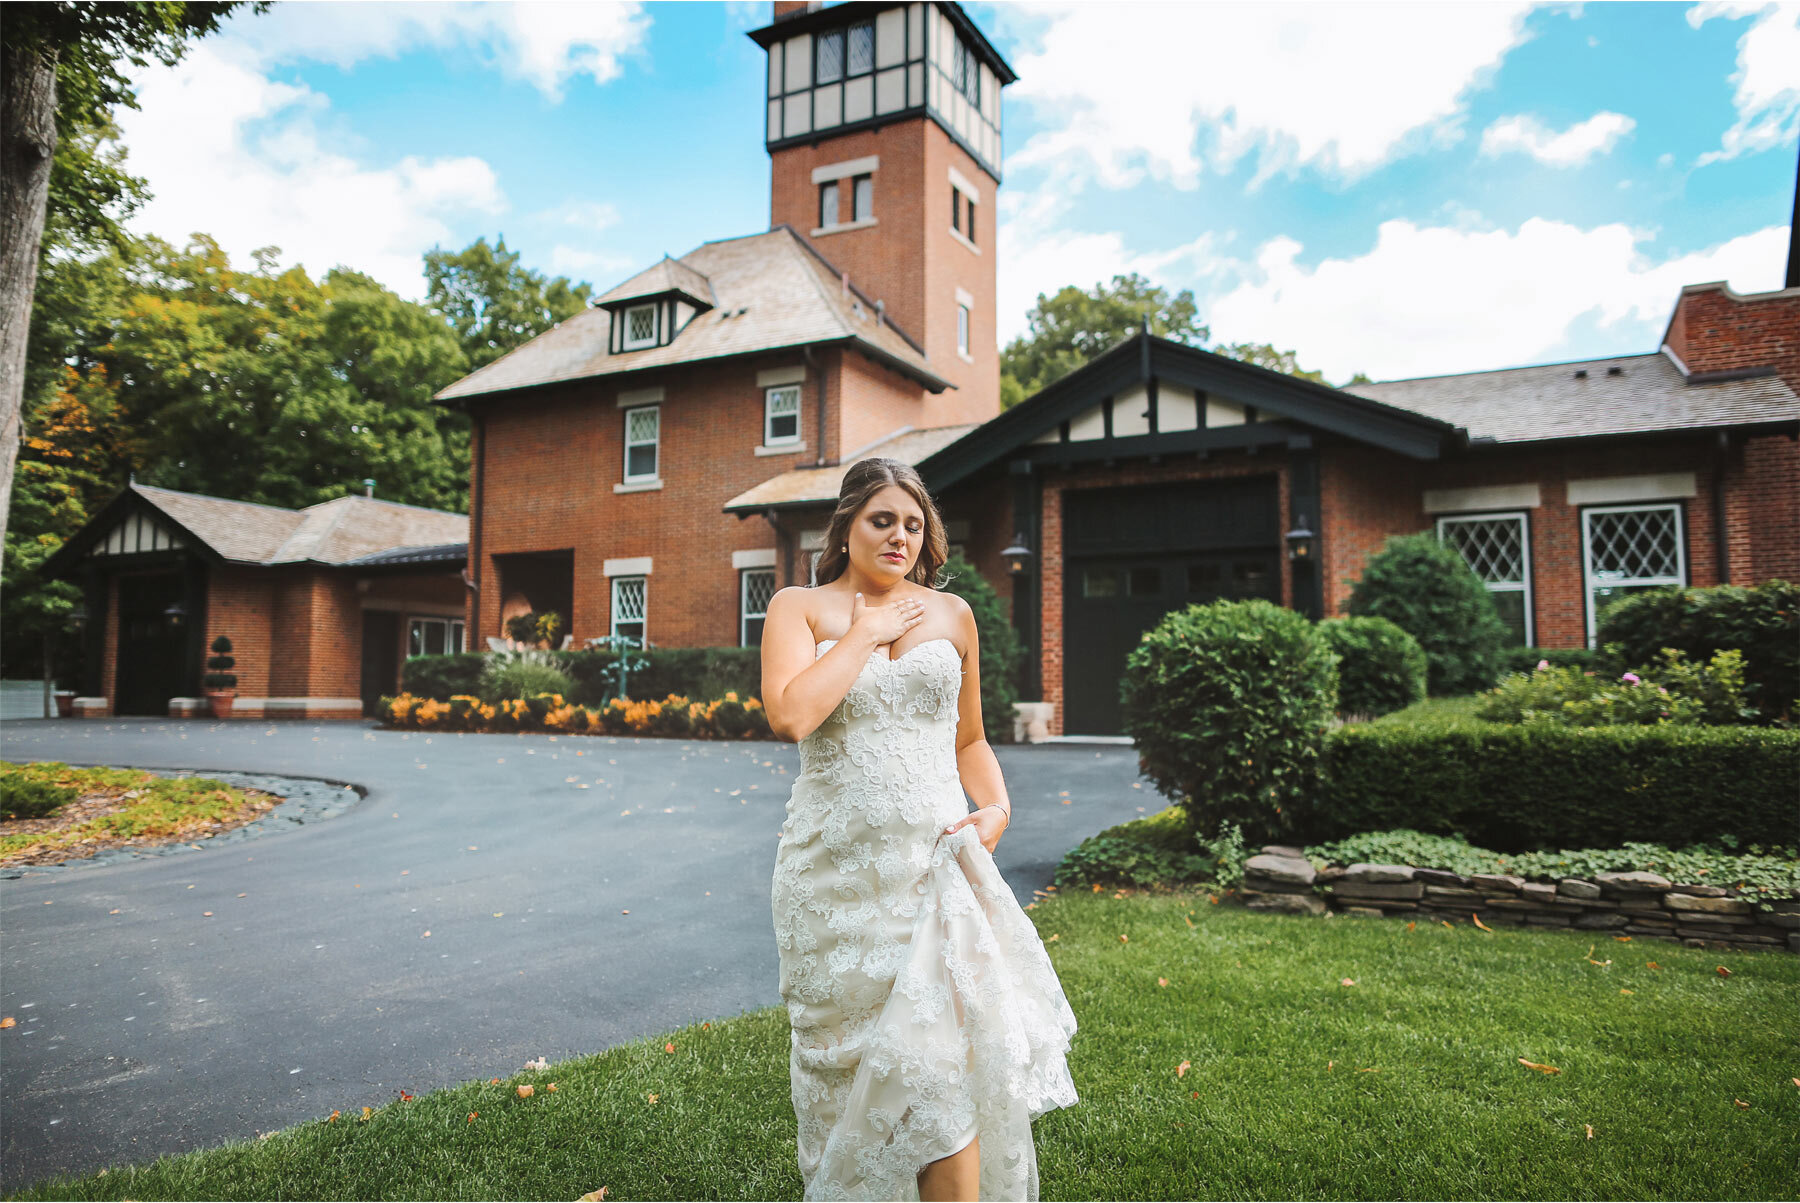 04-Vick-Photography-Wedding-Minnetonka-Minnesota-Family-Home-Bride-Katie-and-David.jpg